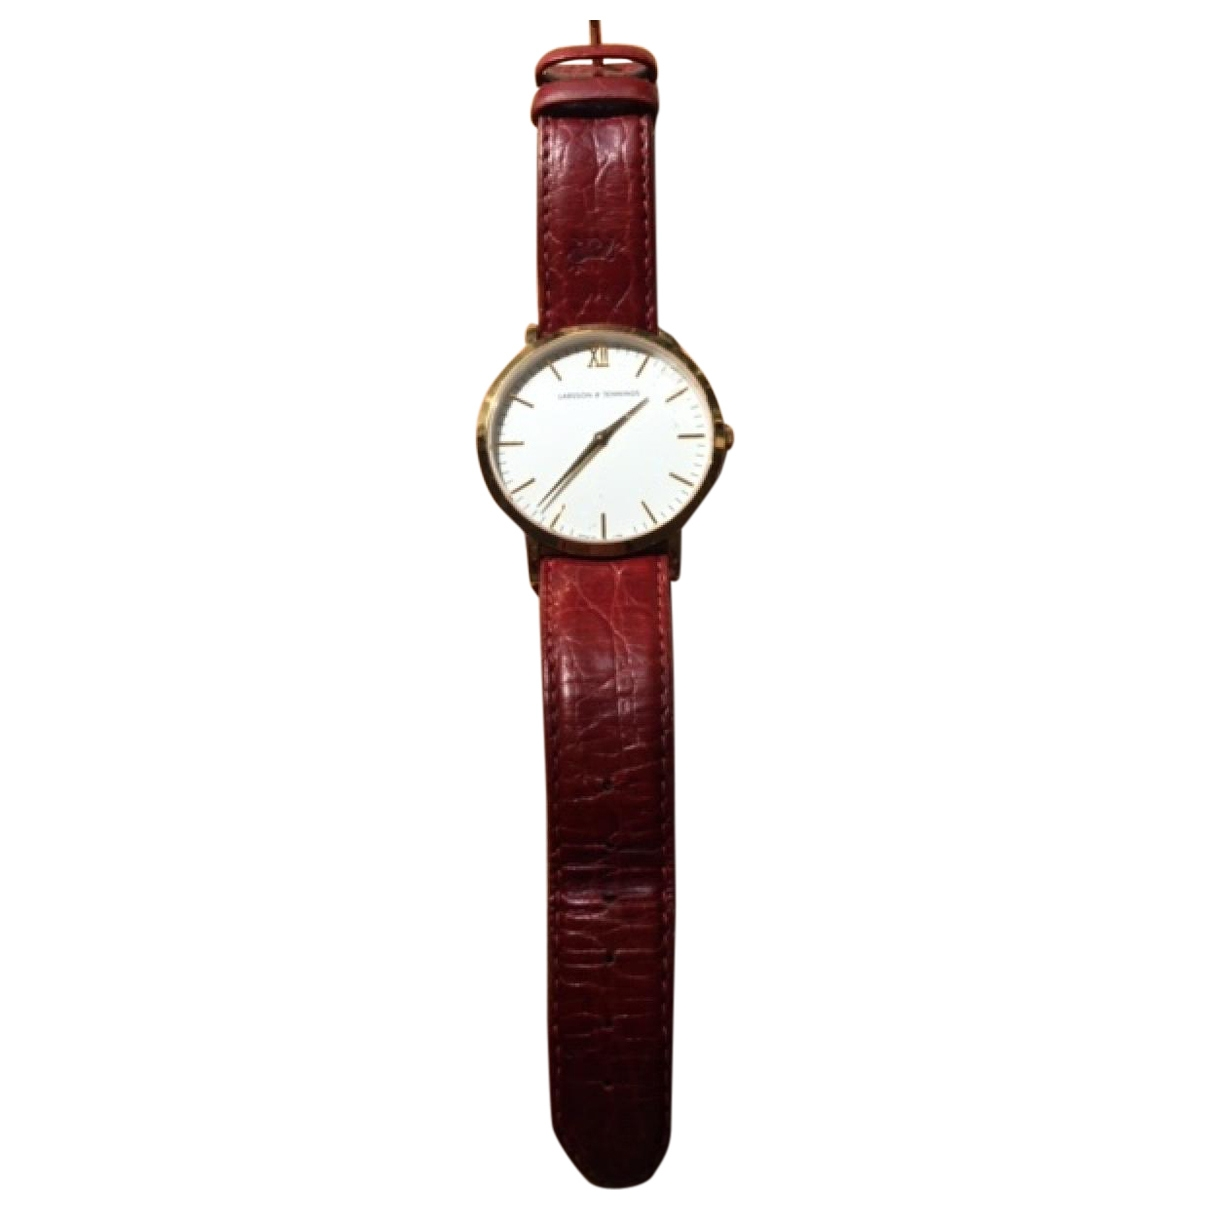 Larsson & Jennings \N Red Yellow gold watch for Women \N